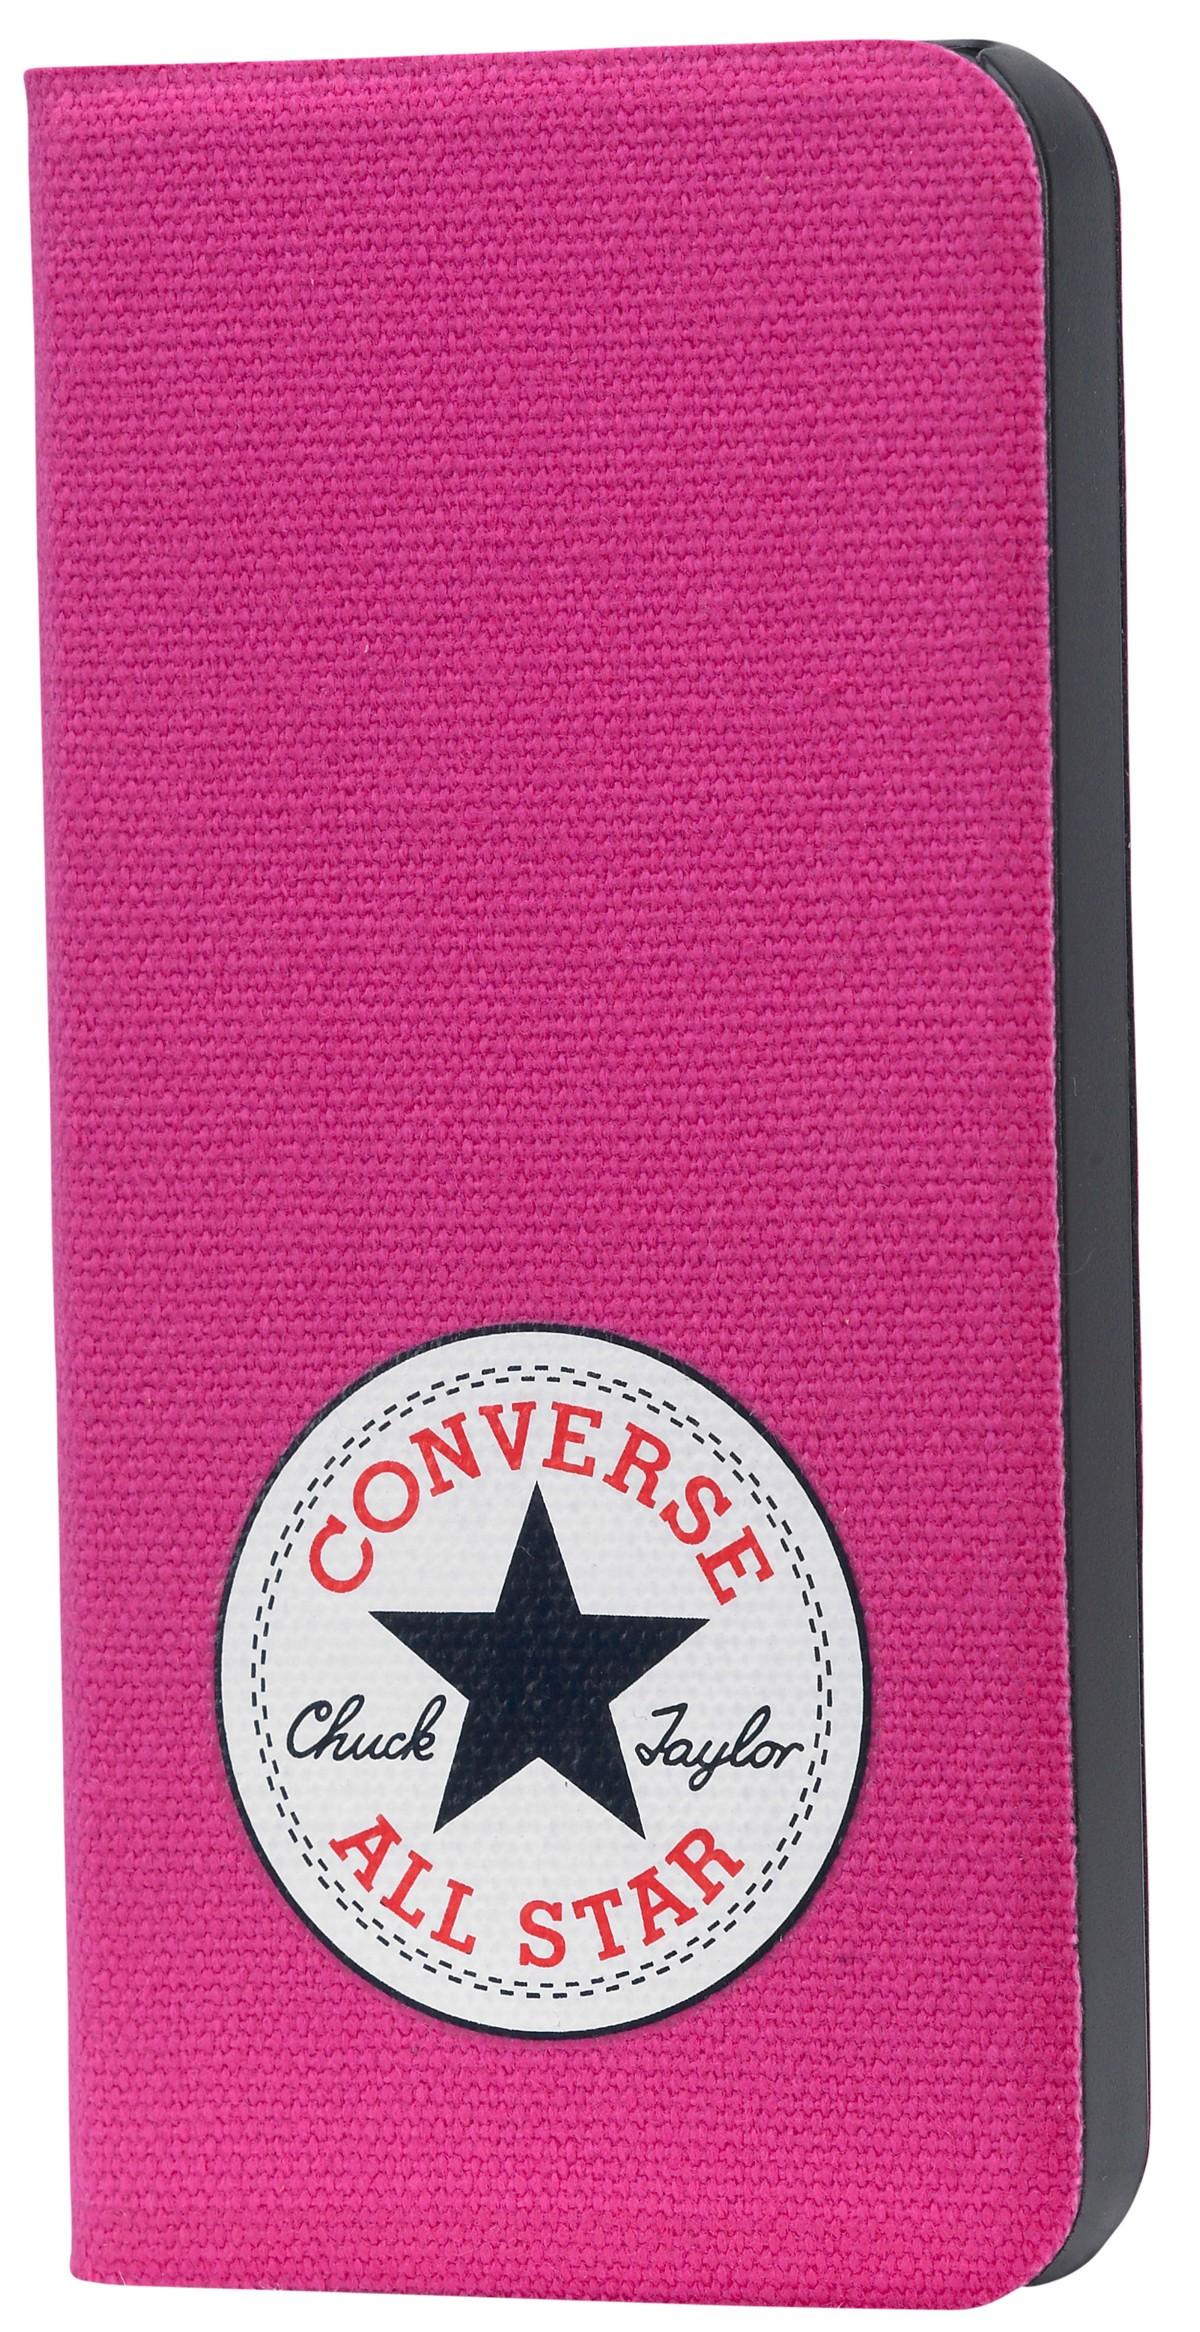 410870-686 : Converse mobildeksel til iPhone 5 (rosa)